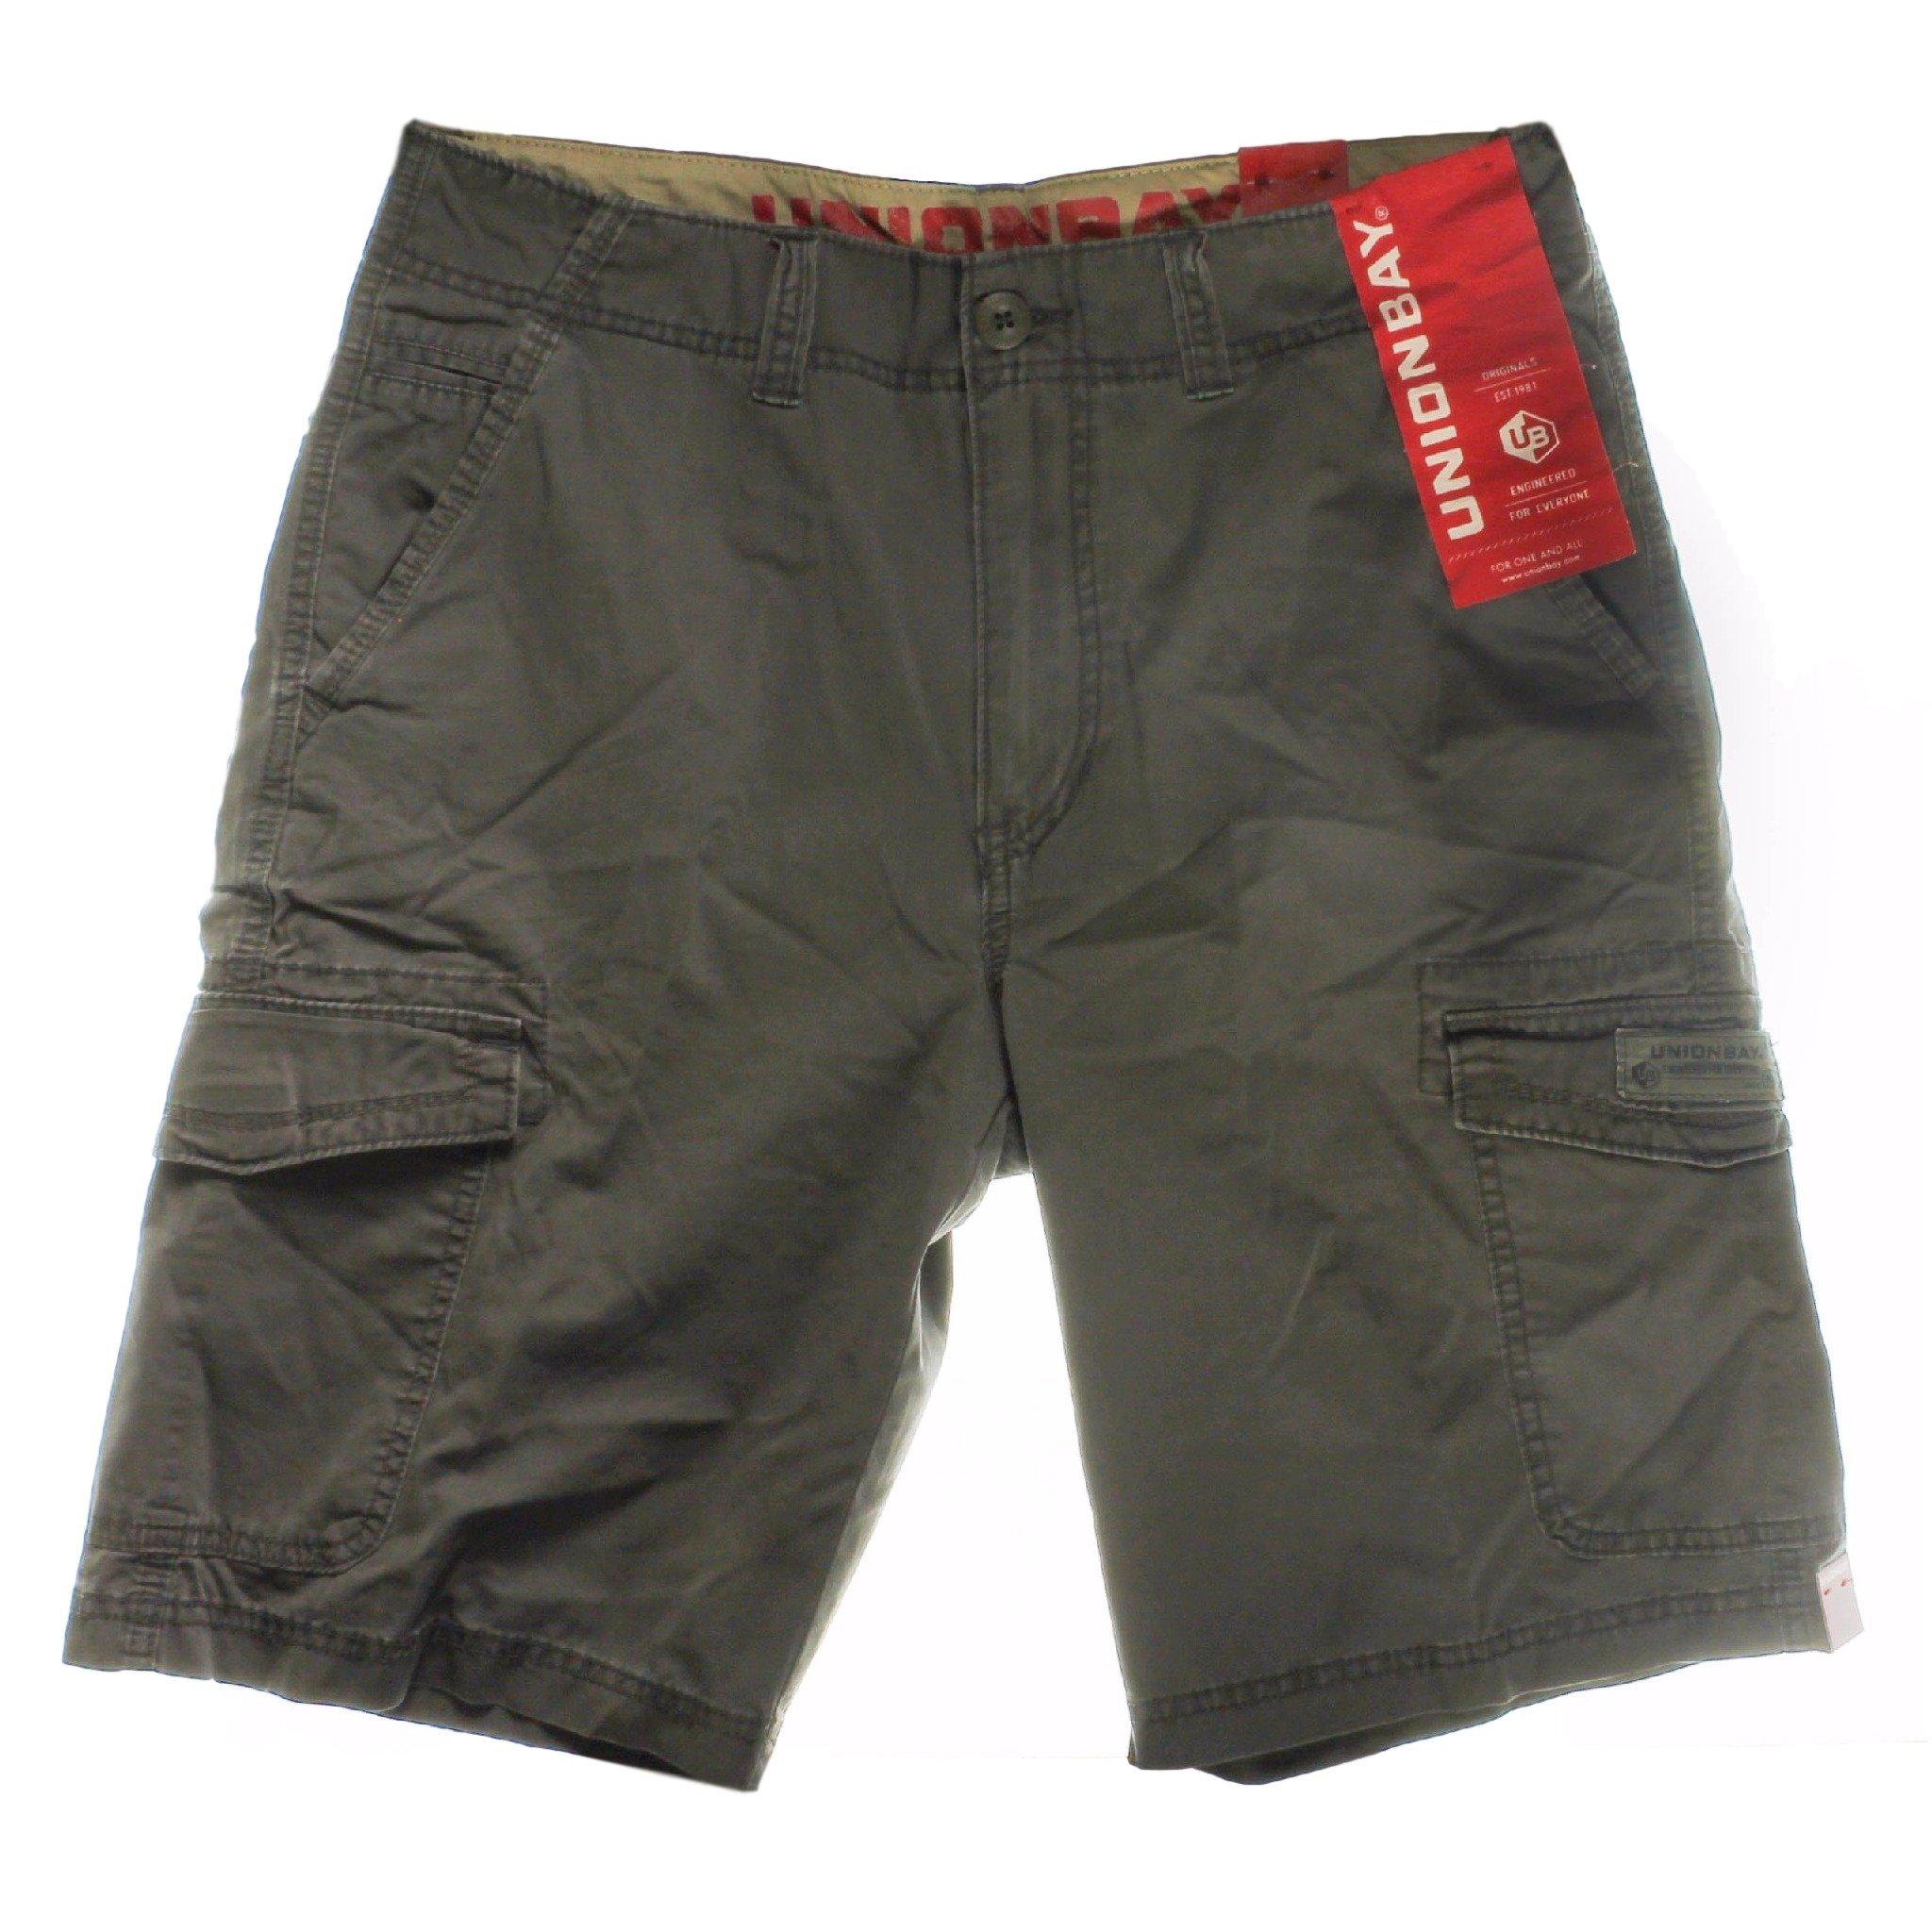 UNIONBAY Cargo Shorts for Men (32, Flint)